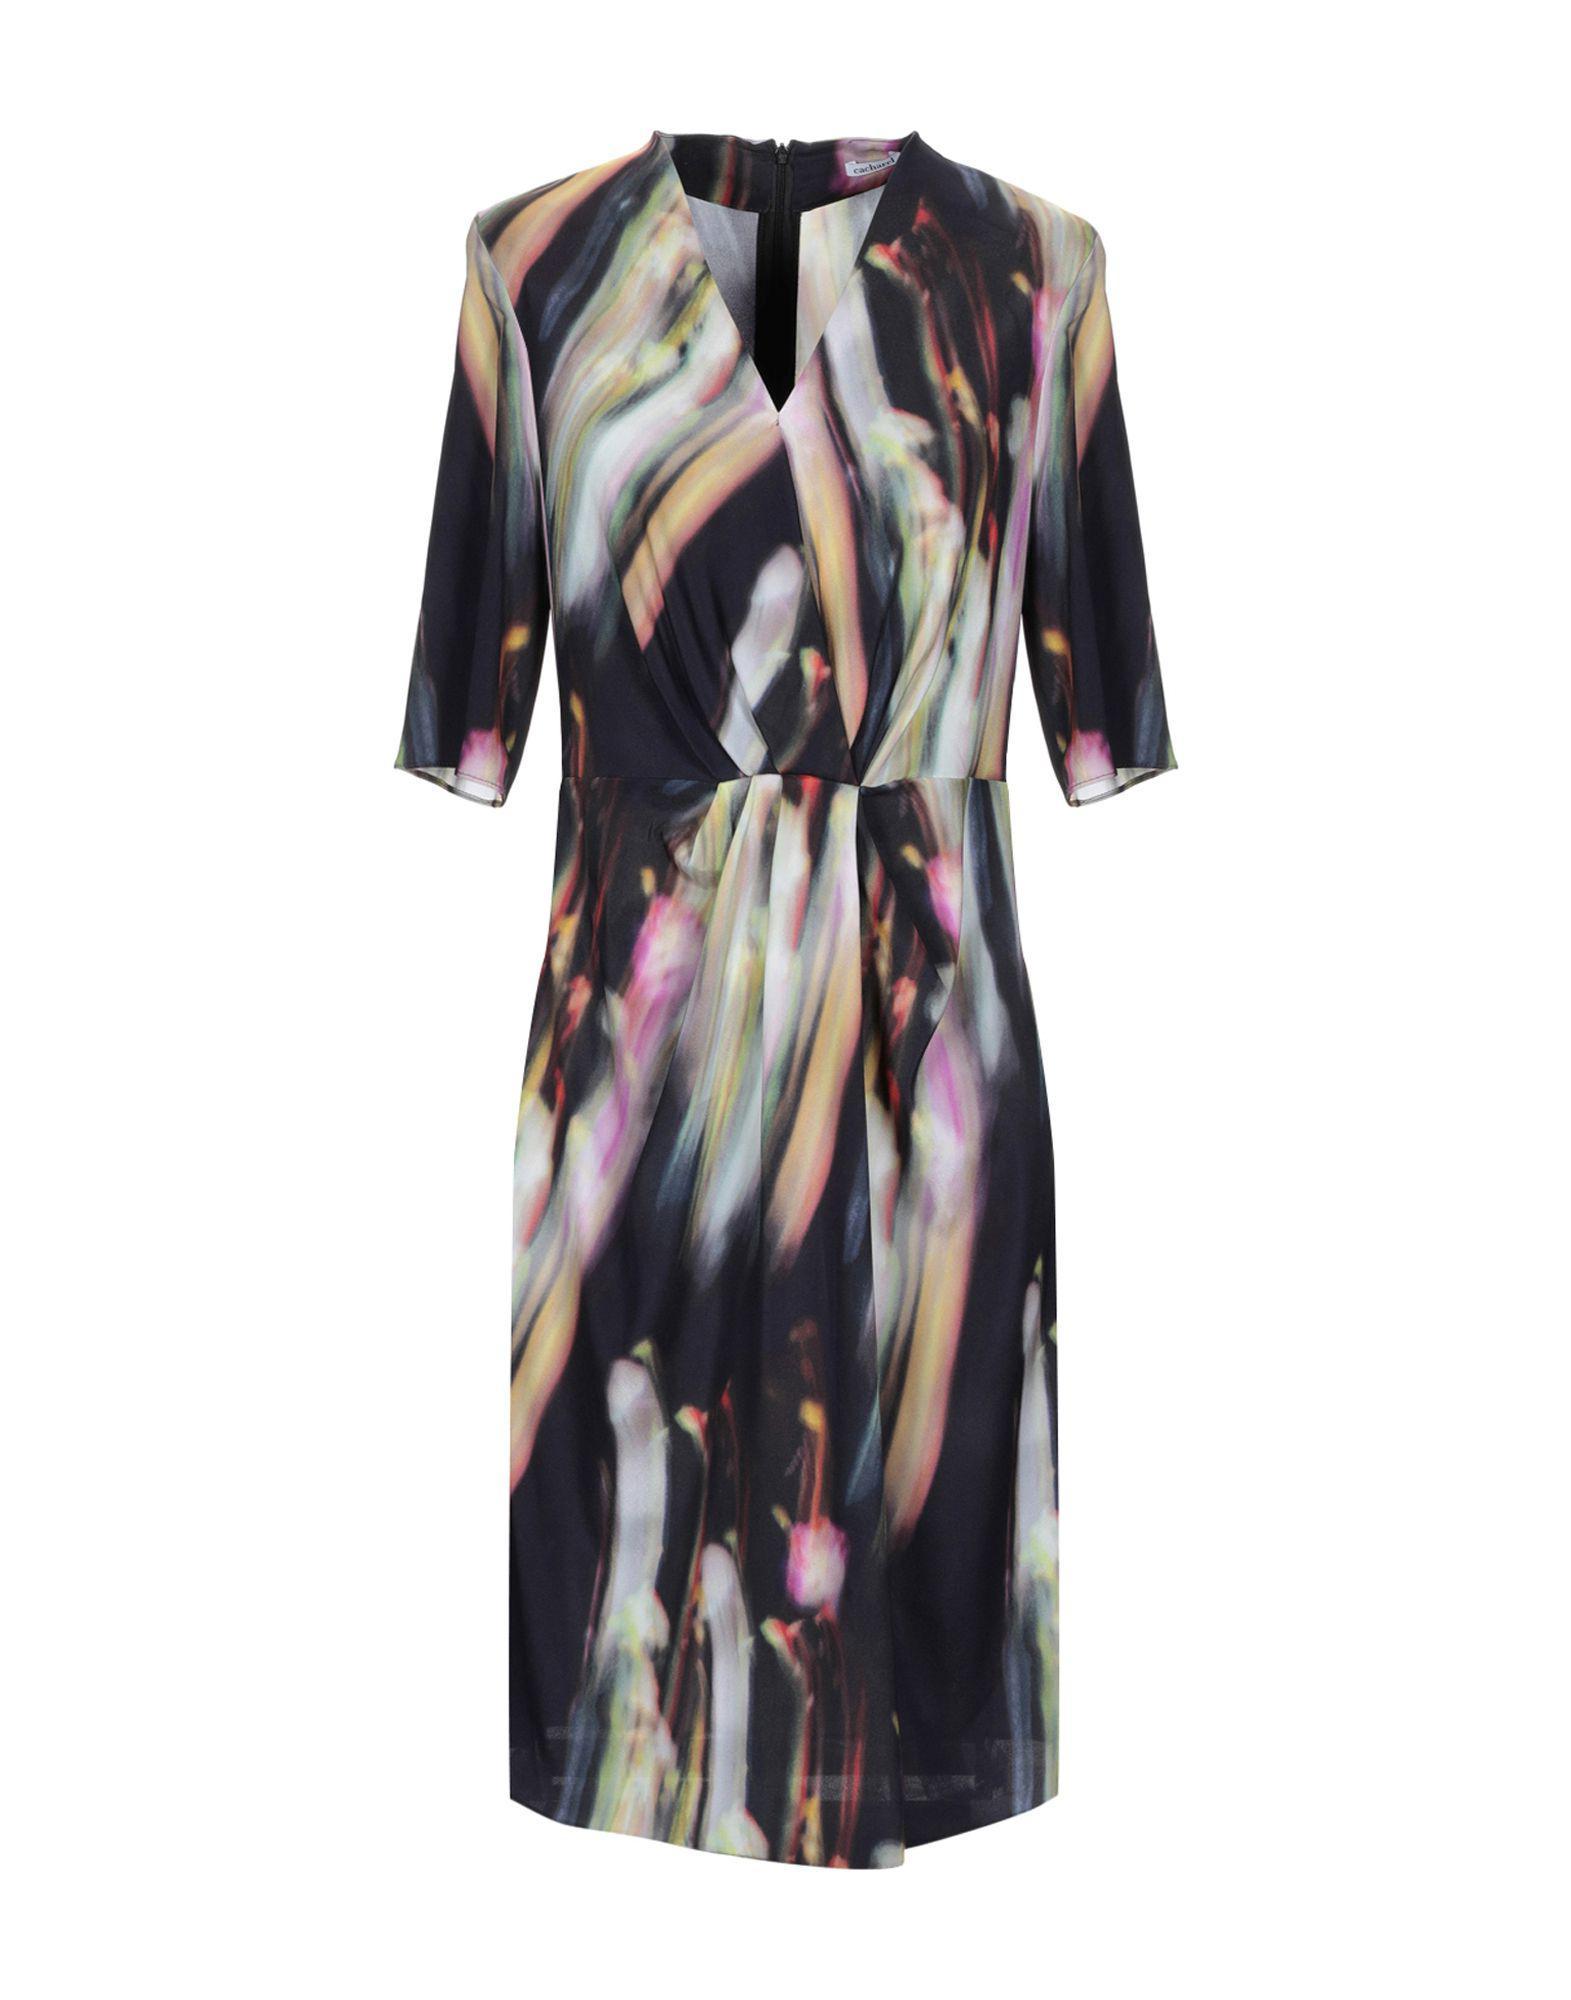 Cacharel Lyst Length Dress Purple Knee In rYqCrw86